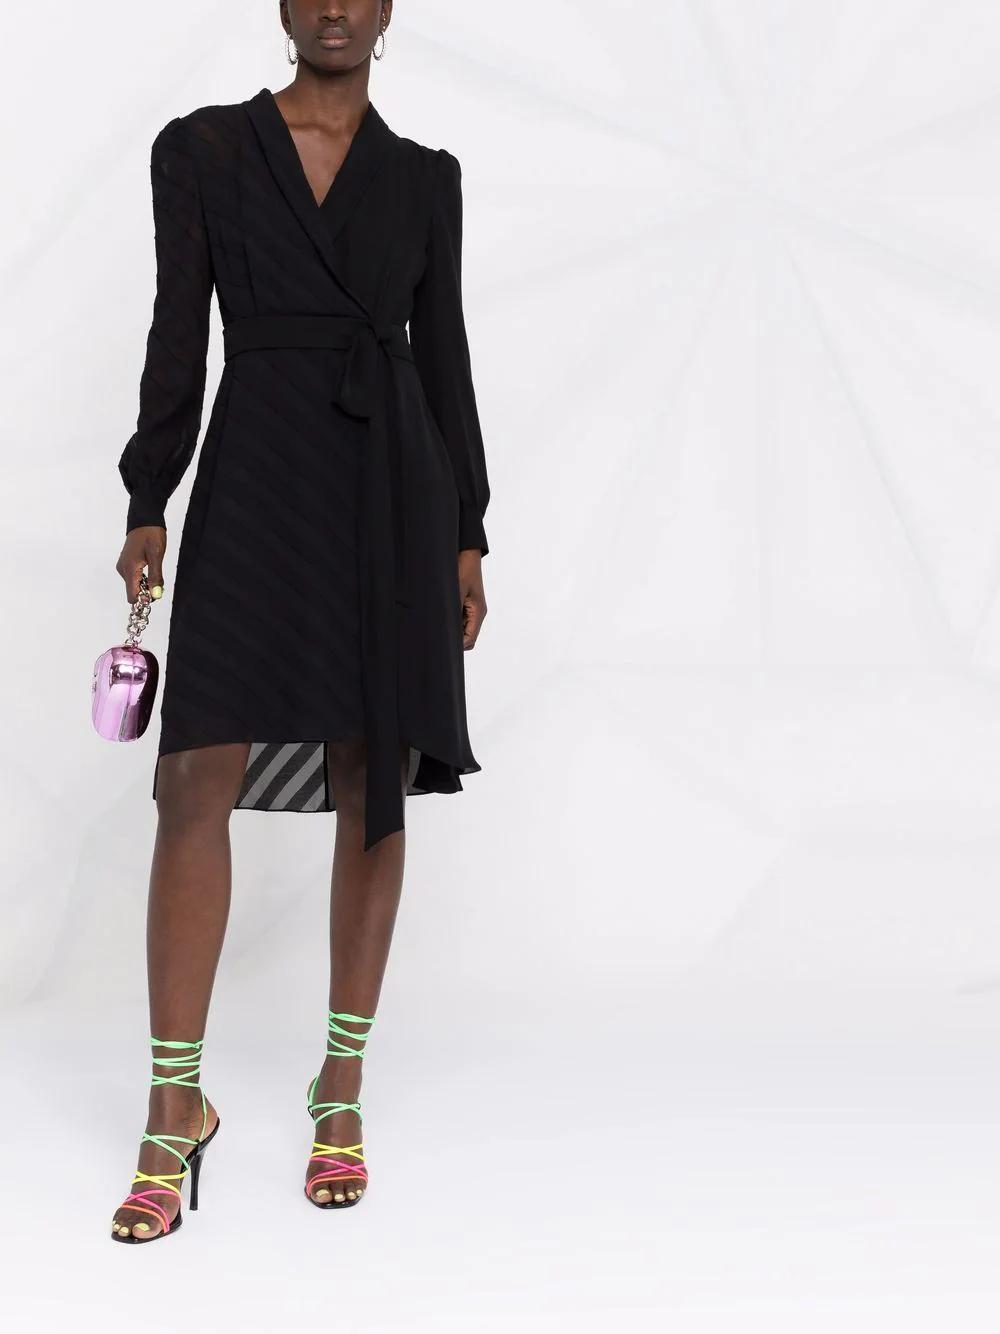 Moschino Gathered Silk Dress 2445лв